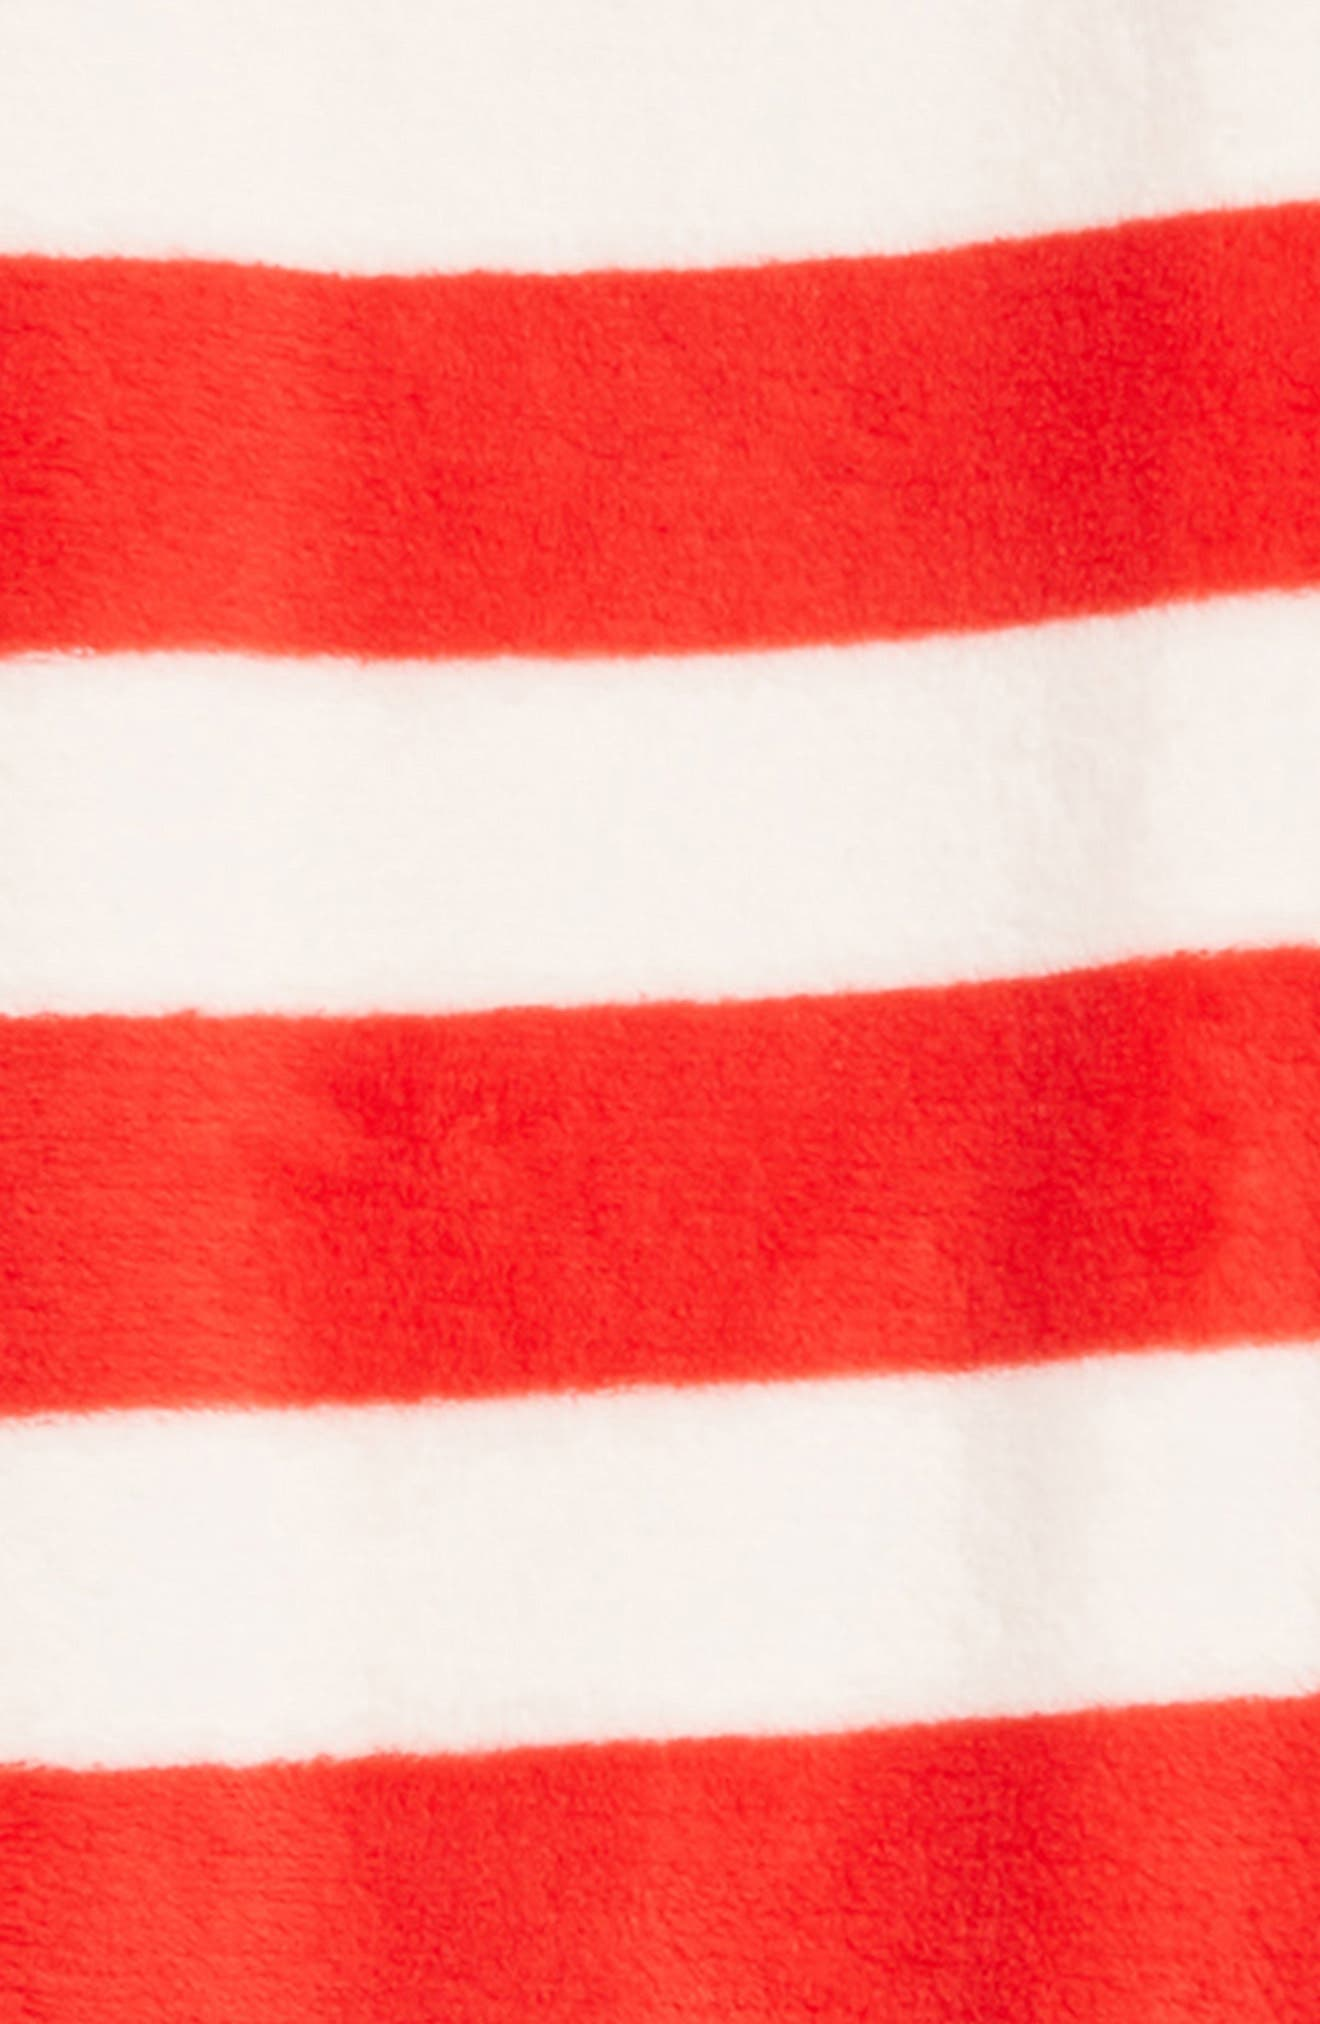 Fleece Pajama Pants,                             Alternate thumbnail 2, color,                             RED BLOOM- IVORY STRIPE